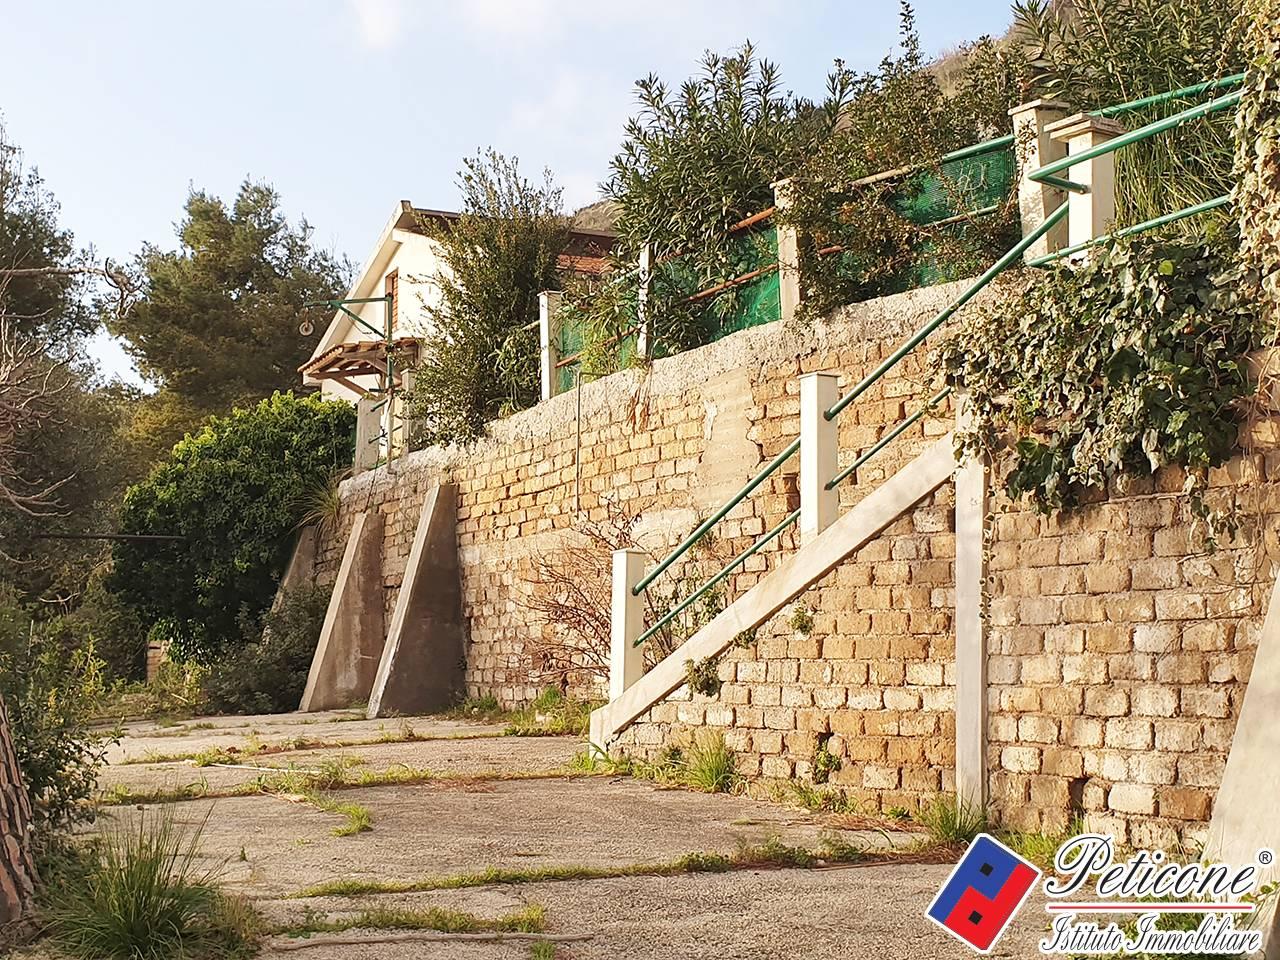 Villa in Vendita a Sperlonga: 3 locali, 50 mq - Foto 5